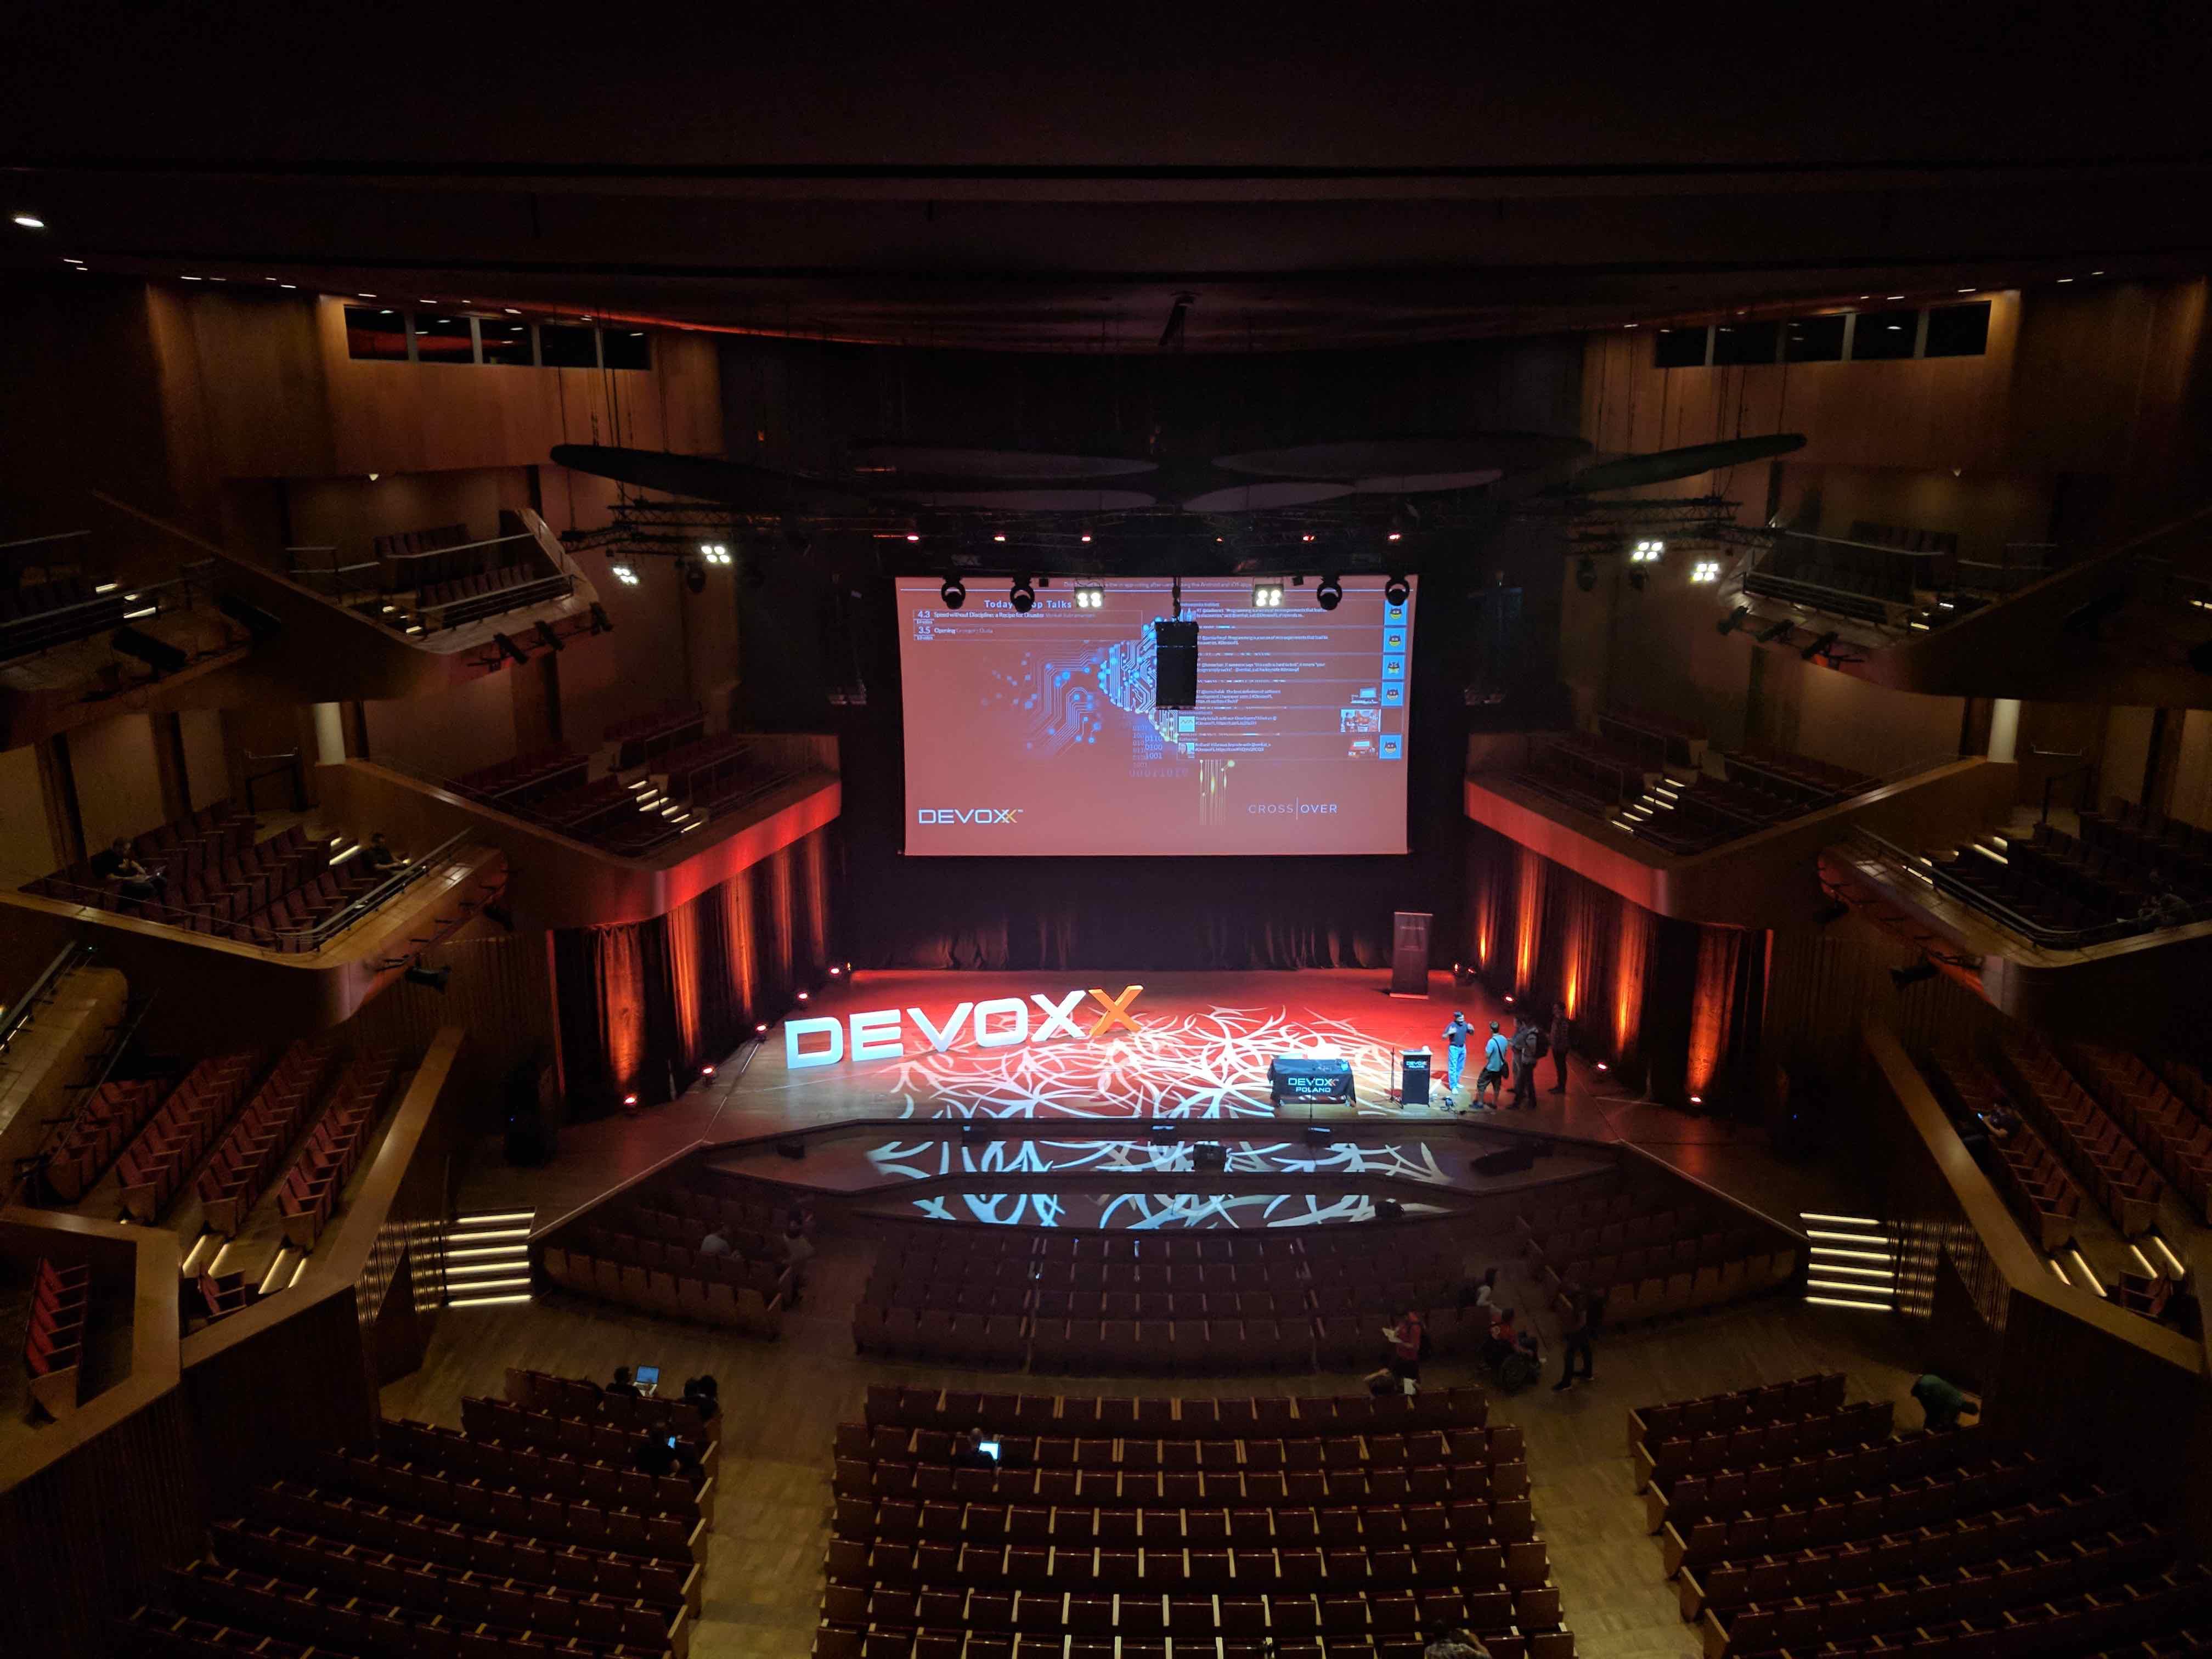 Devoxx Poland 2017  Jeff Mesens and Bart Blommaerts